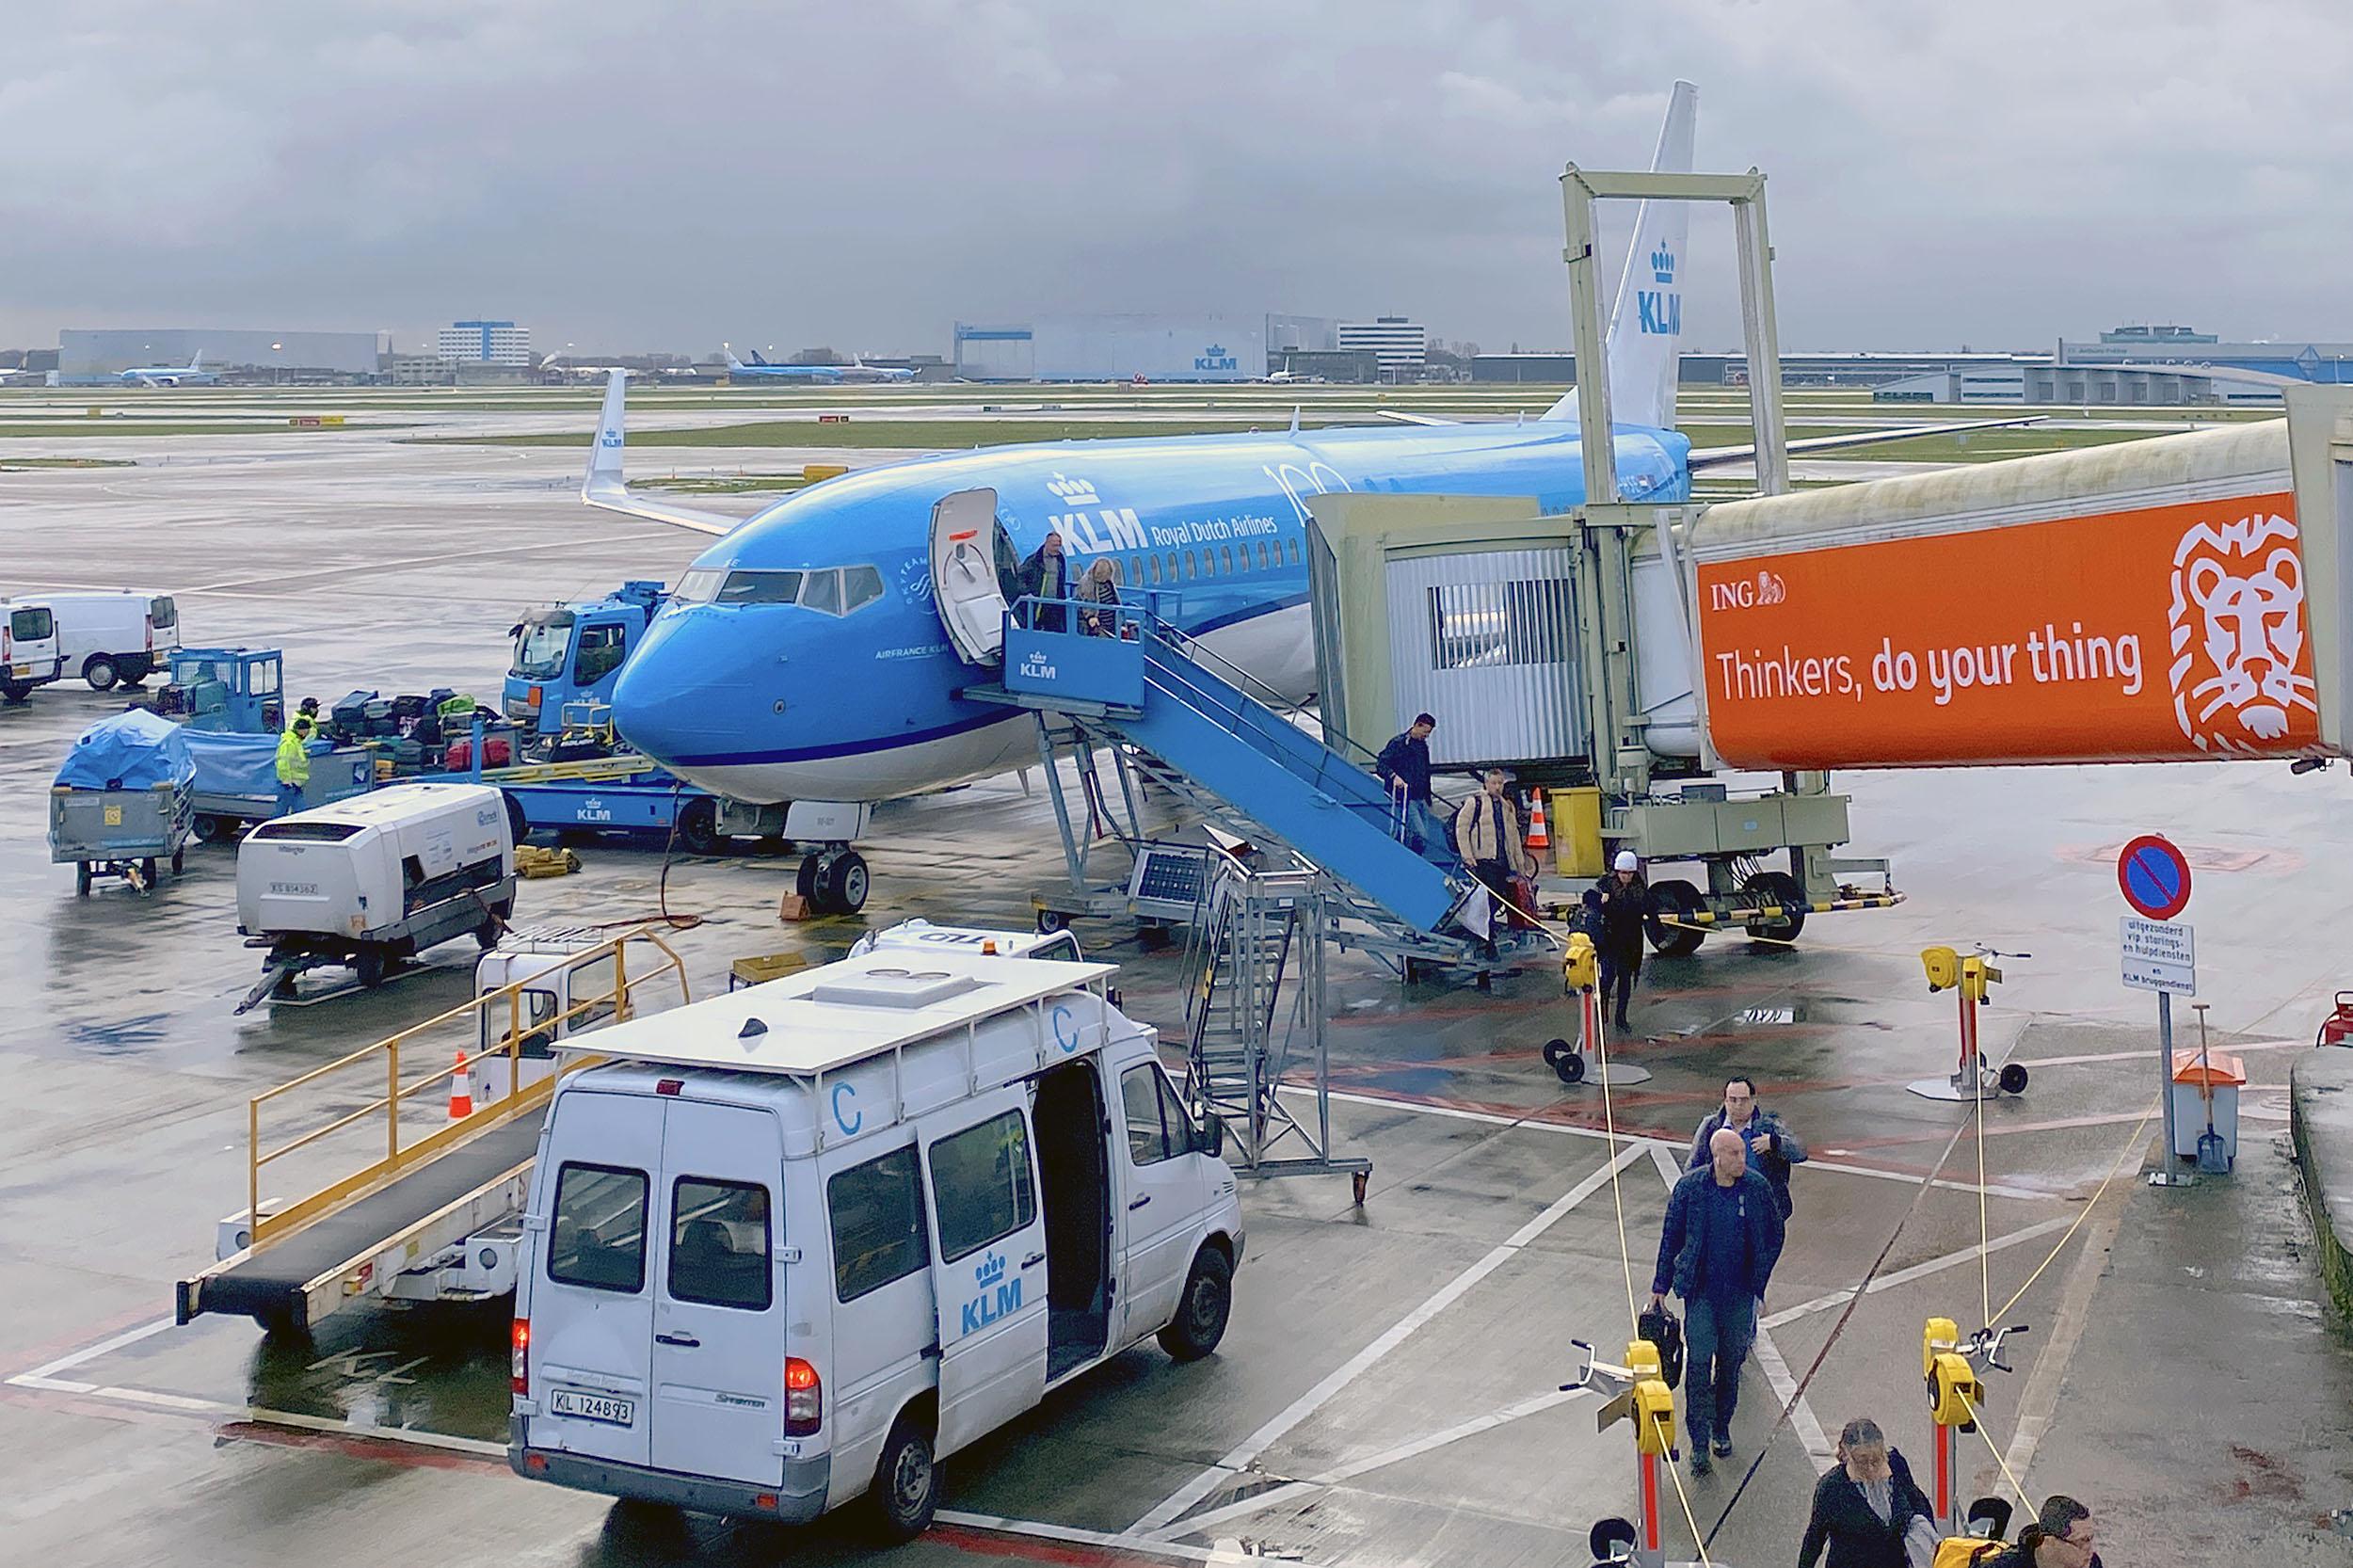 KLM Schiphol Amsterdam